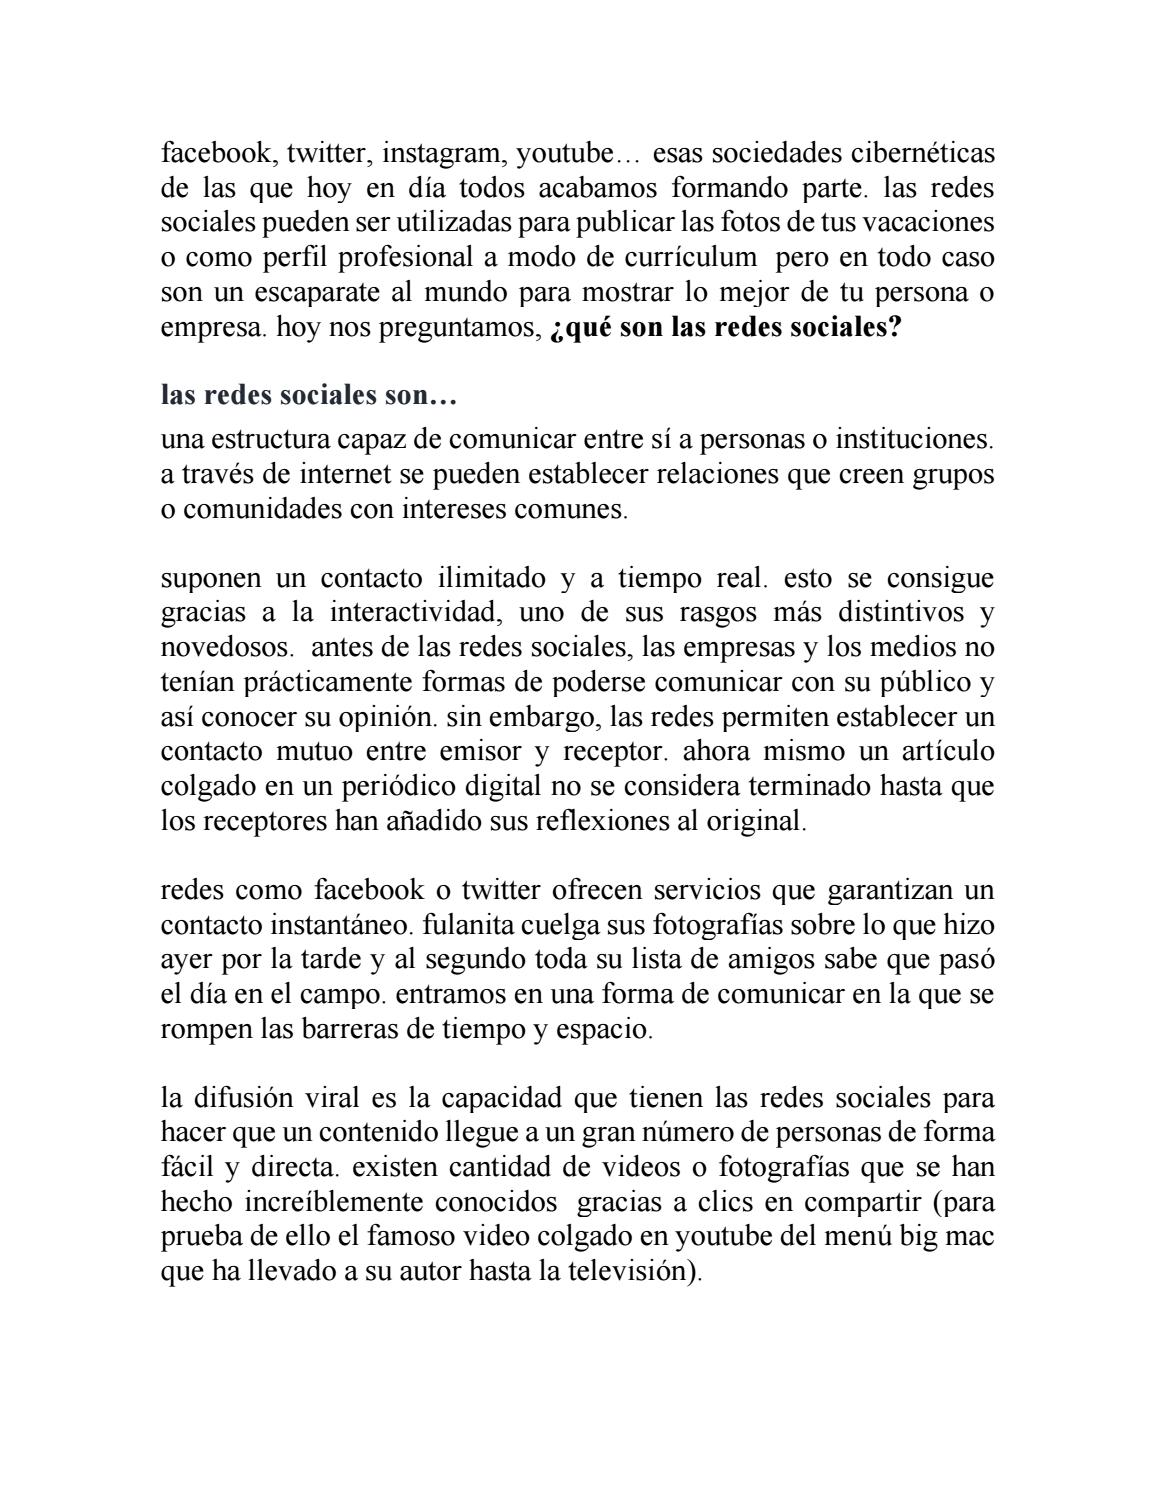 Mateo restrepo by Mateo Restrepo - issuu